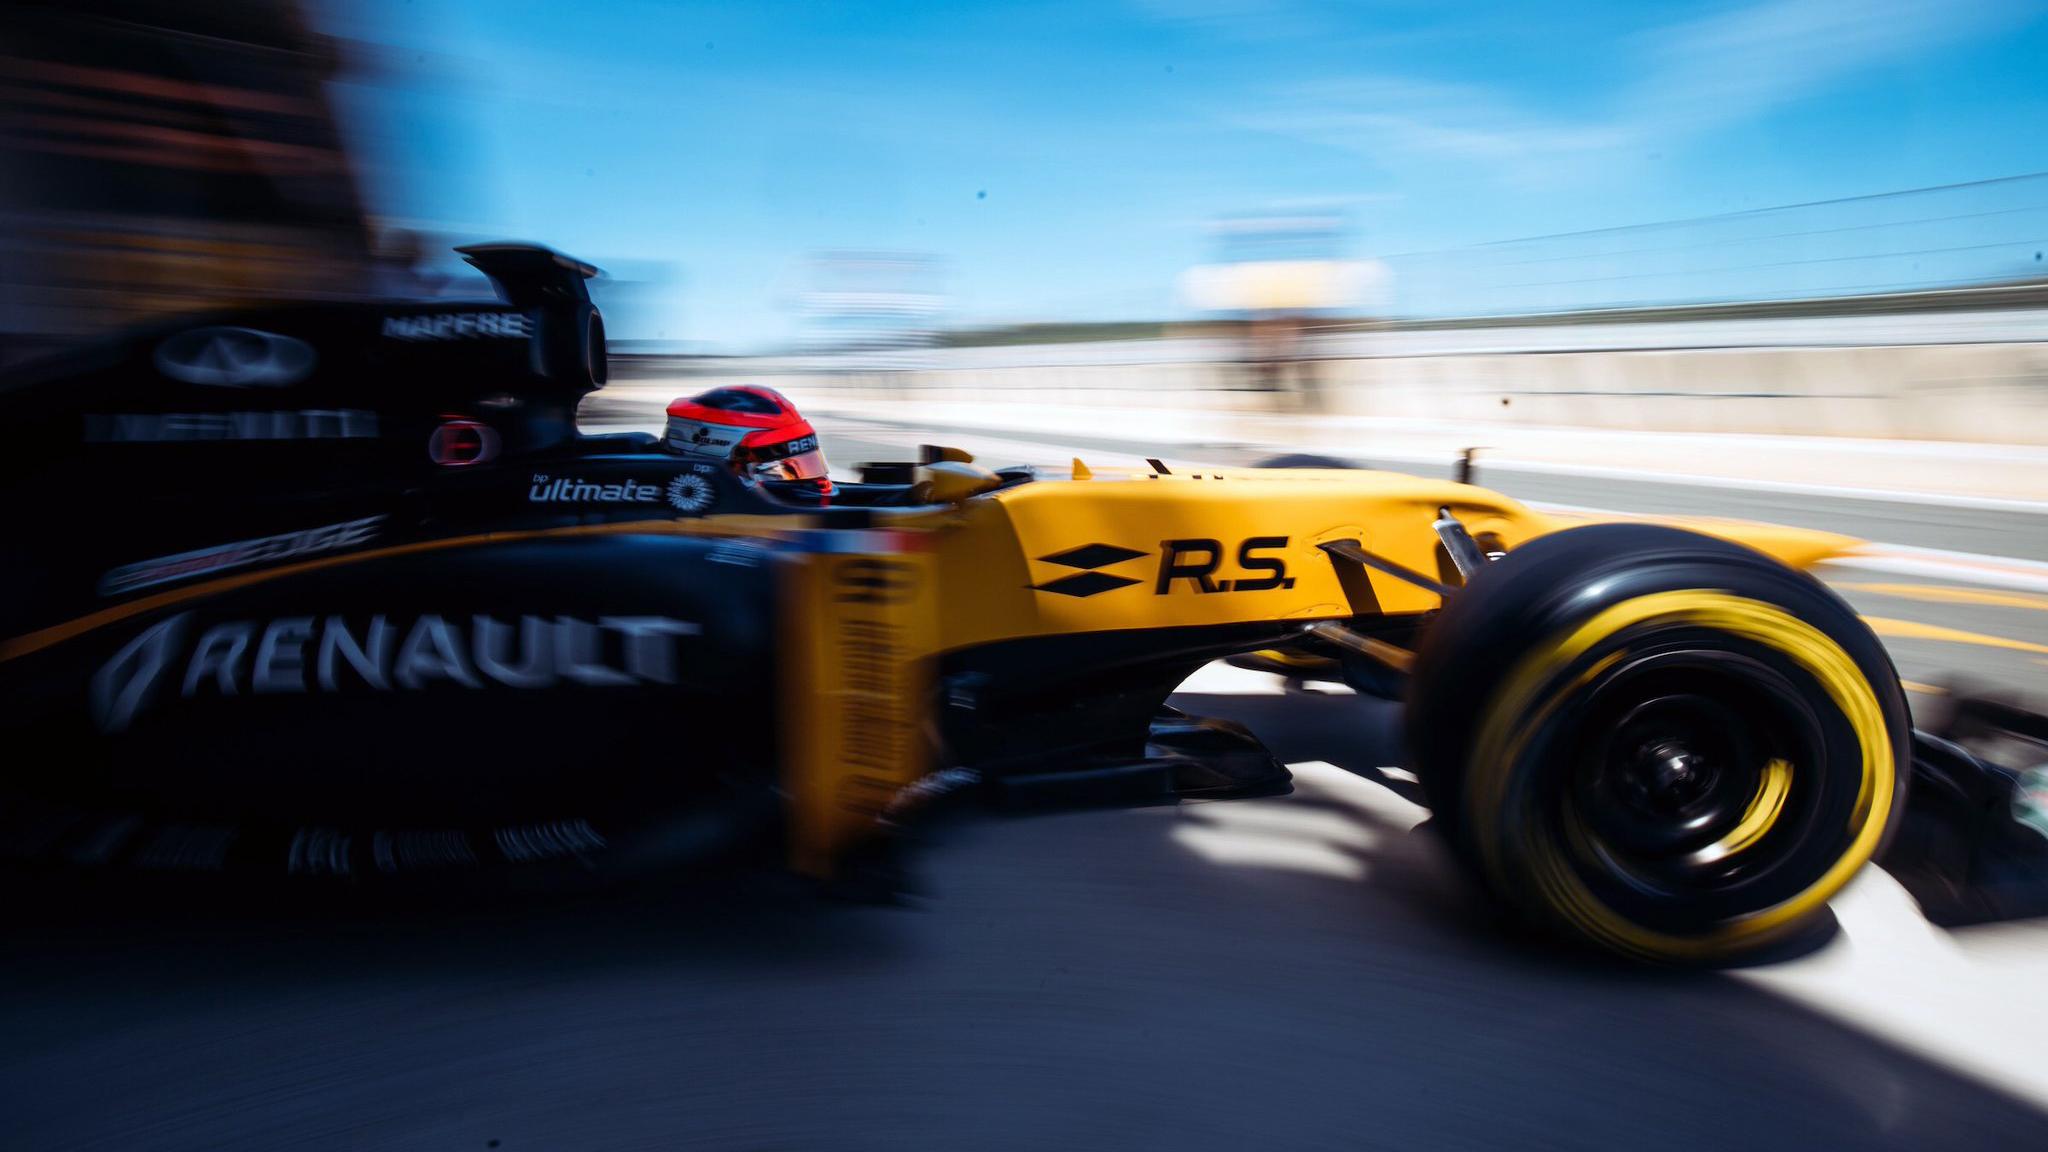 Robert Kubica Formula 1 side